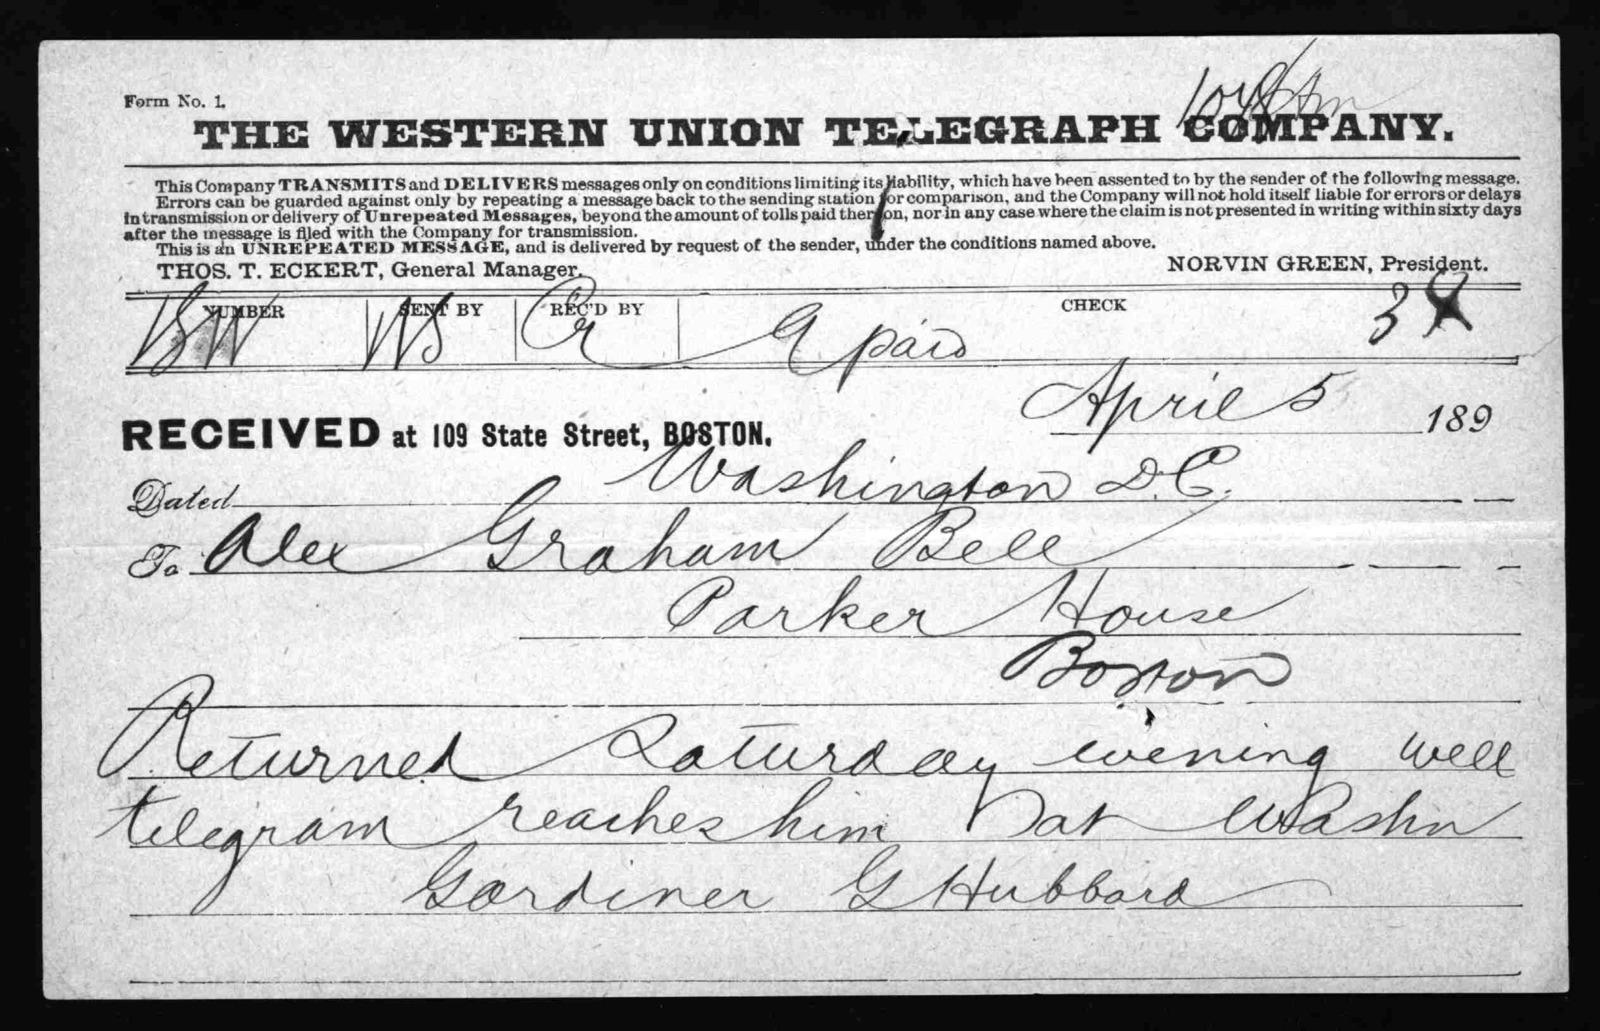 Telegram from Gardiner Greene Hubbard to Alexander Graham Bell, April 5